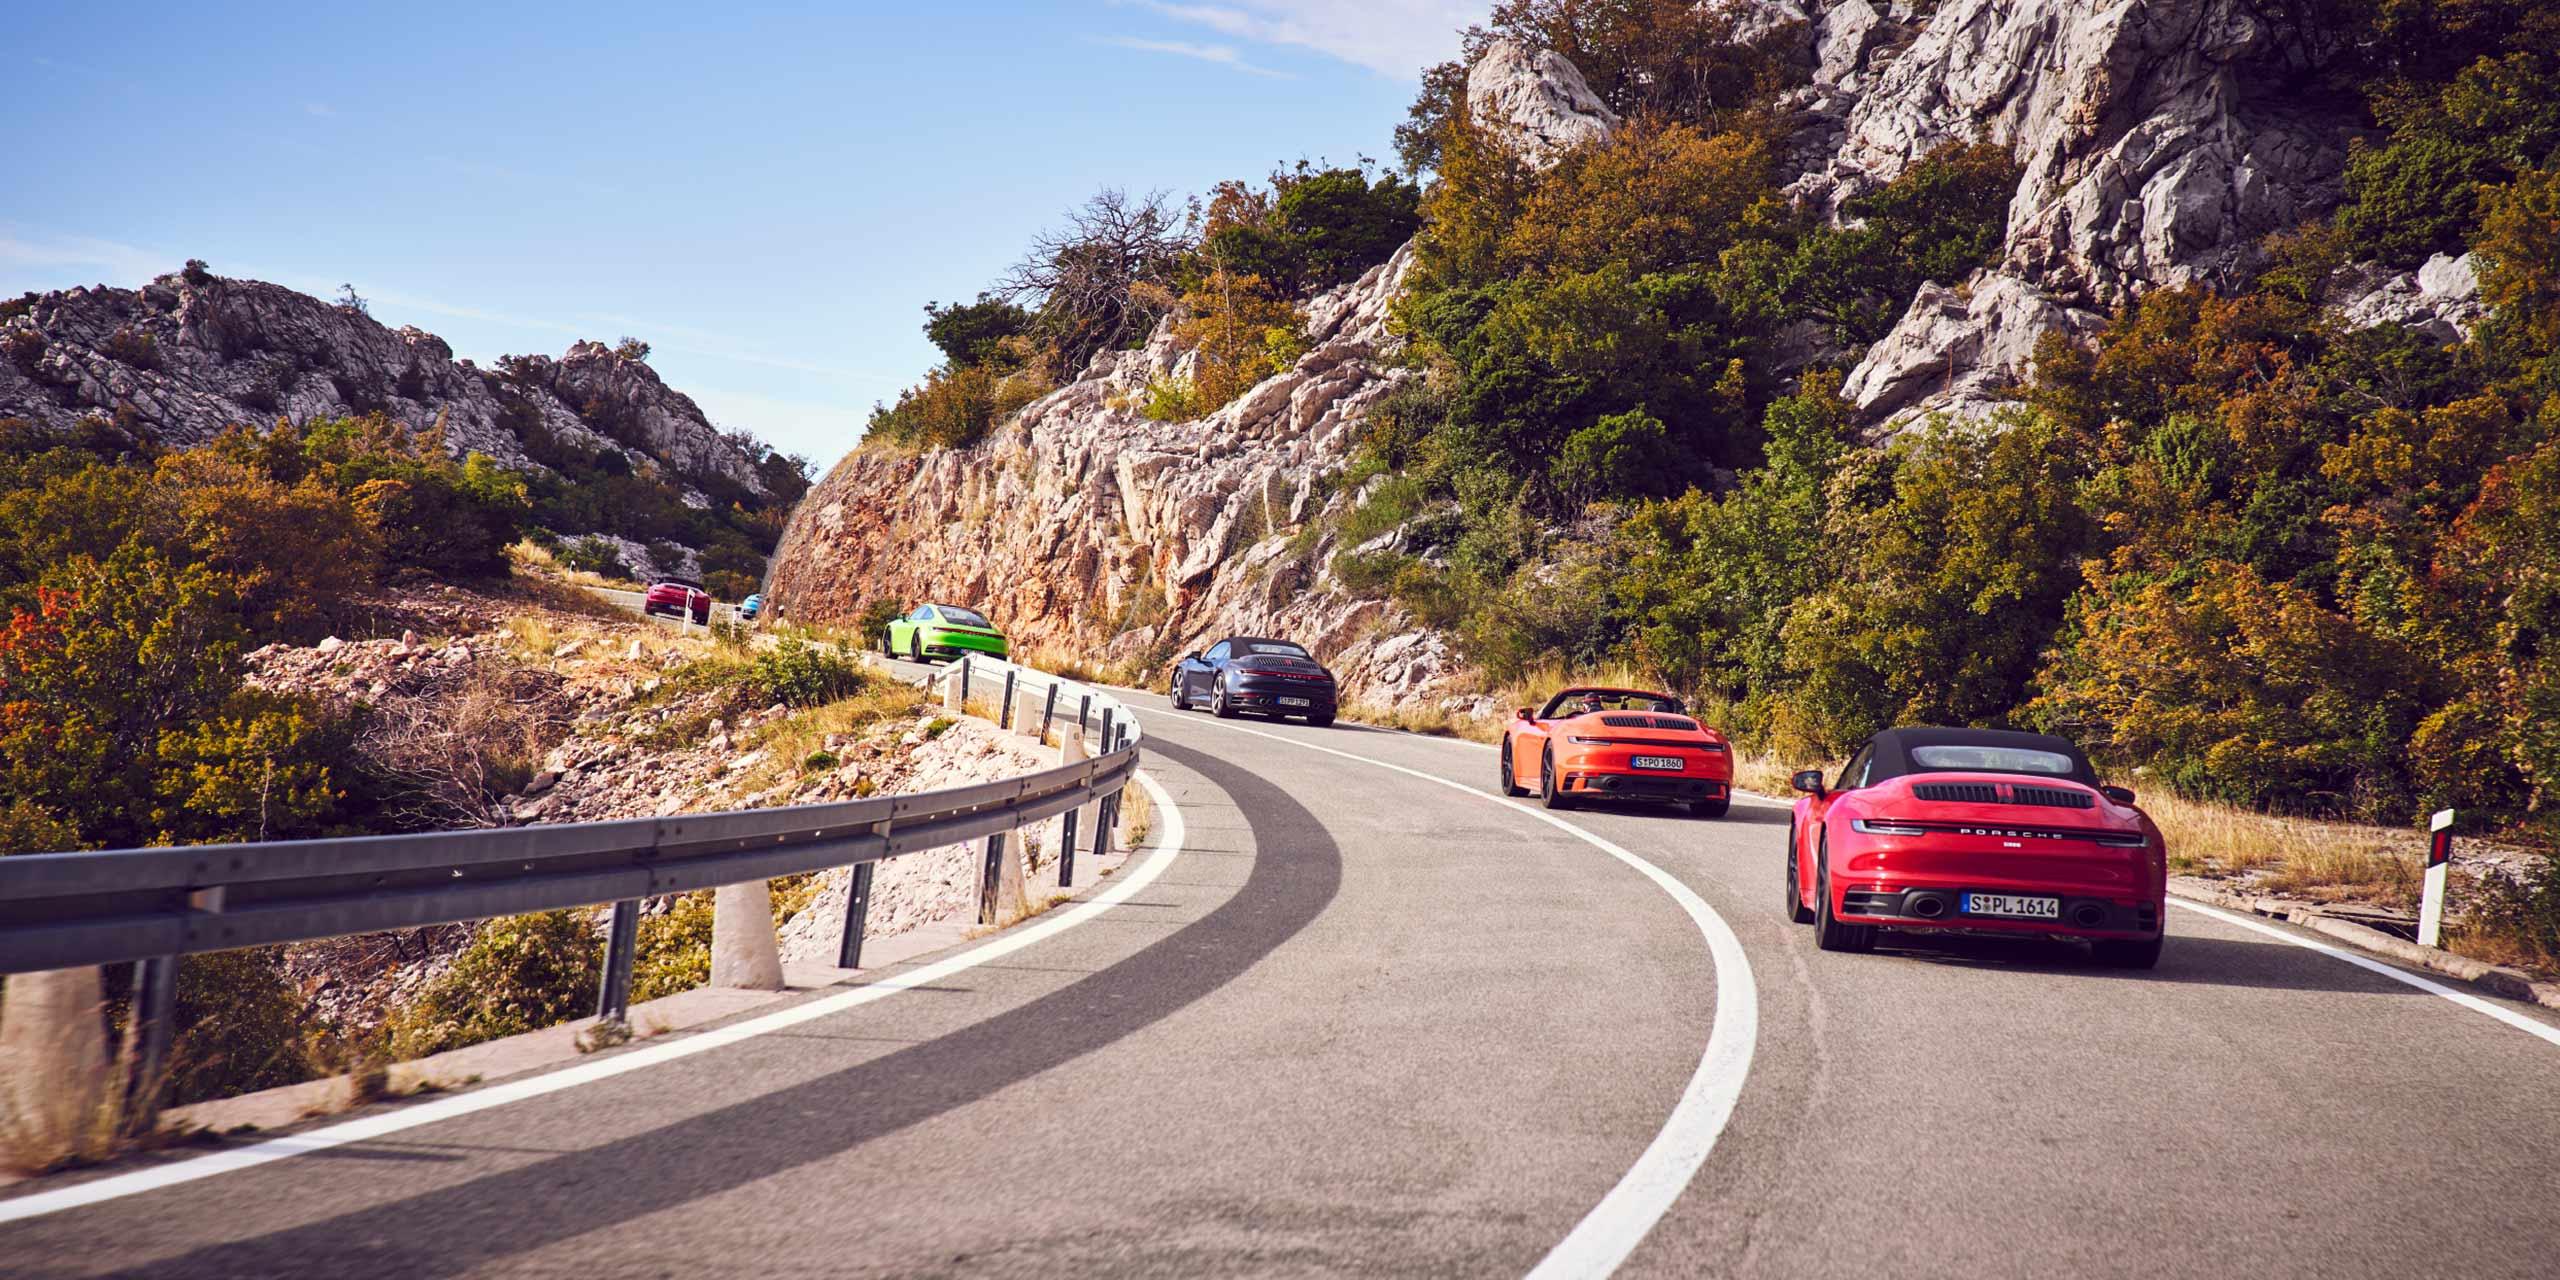 Roomers Baden-Baden Porsche Experience Day Package